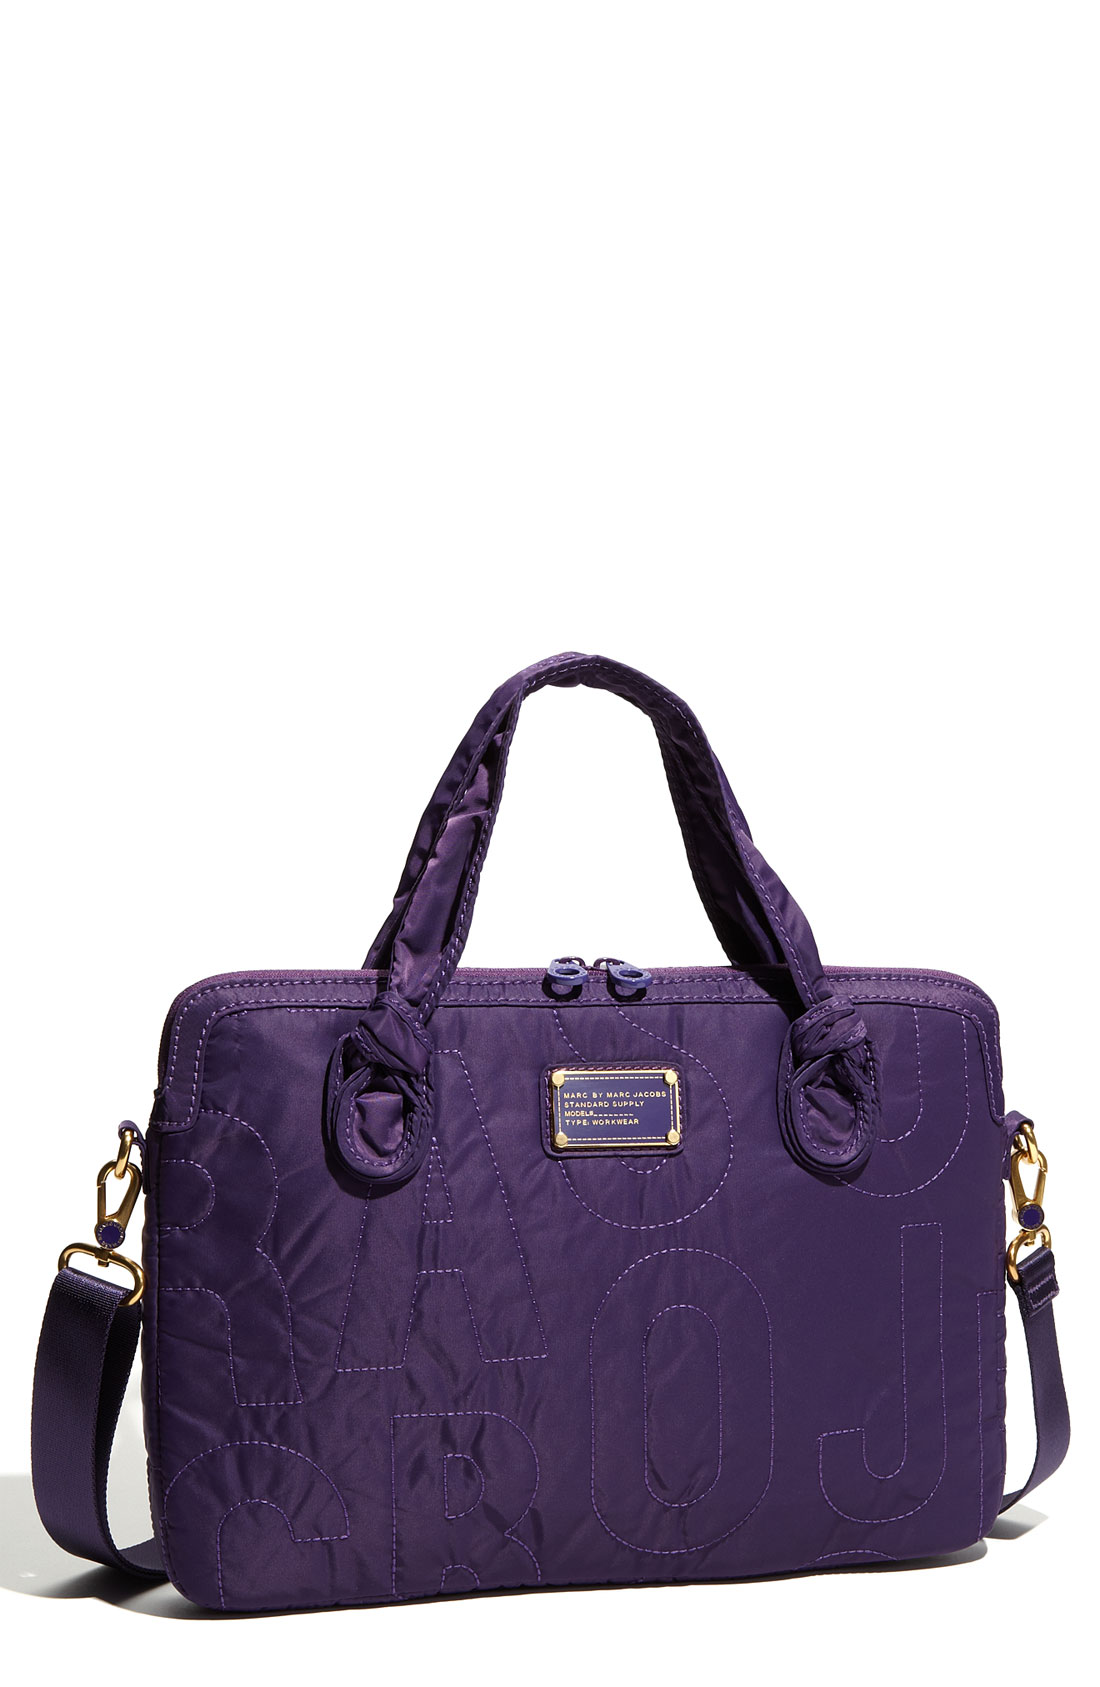 marc by marc jacobs pretty nylon 15 laptop commuter case in purple bright grape lyst. Black Bedroom Furniture Sets. Home Design Ideas